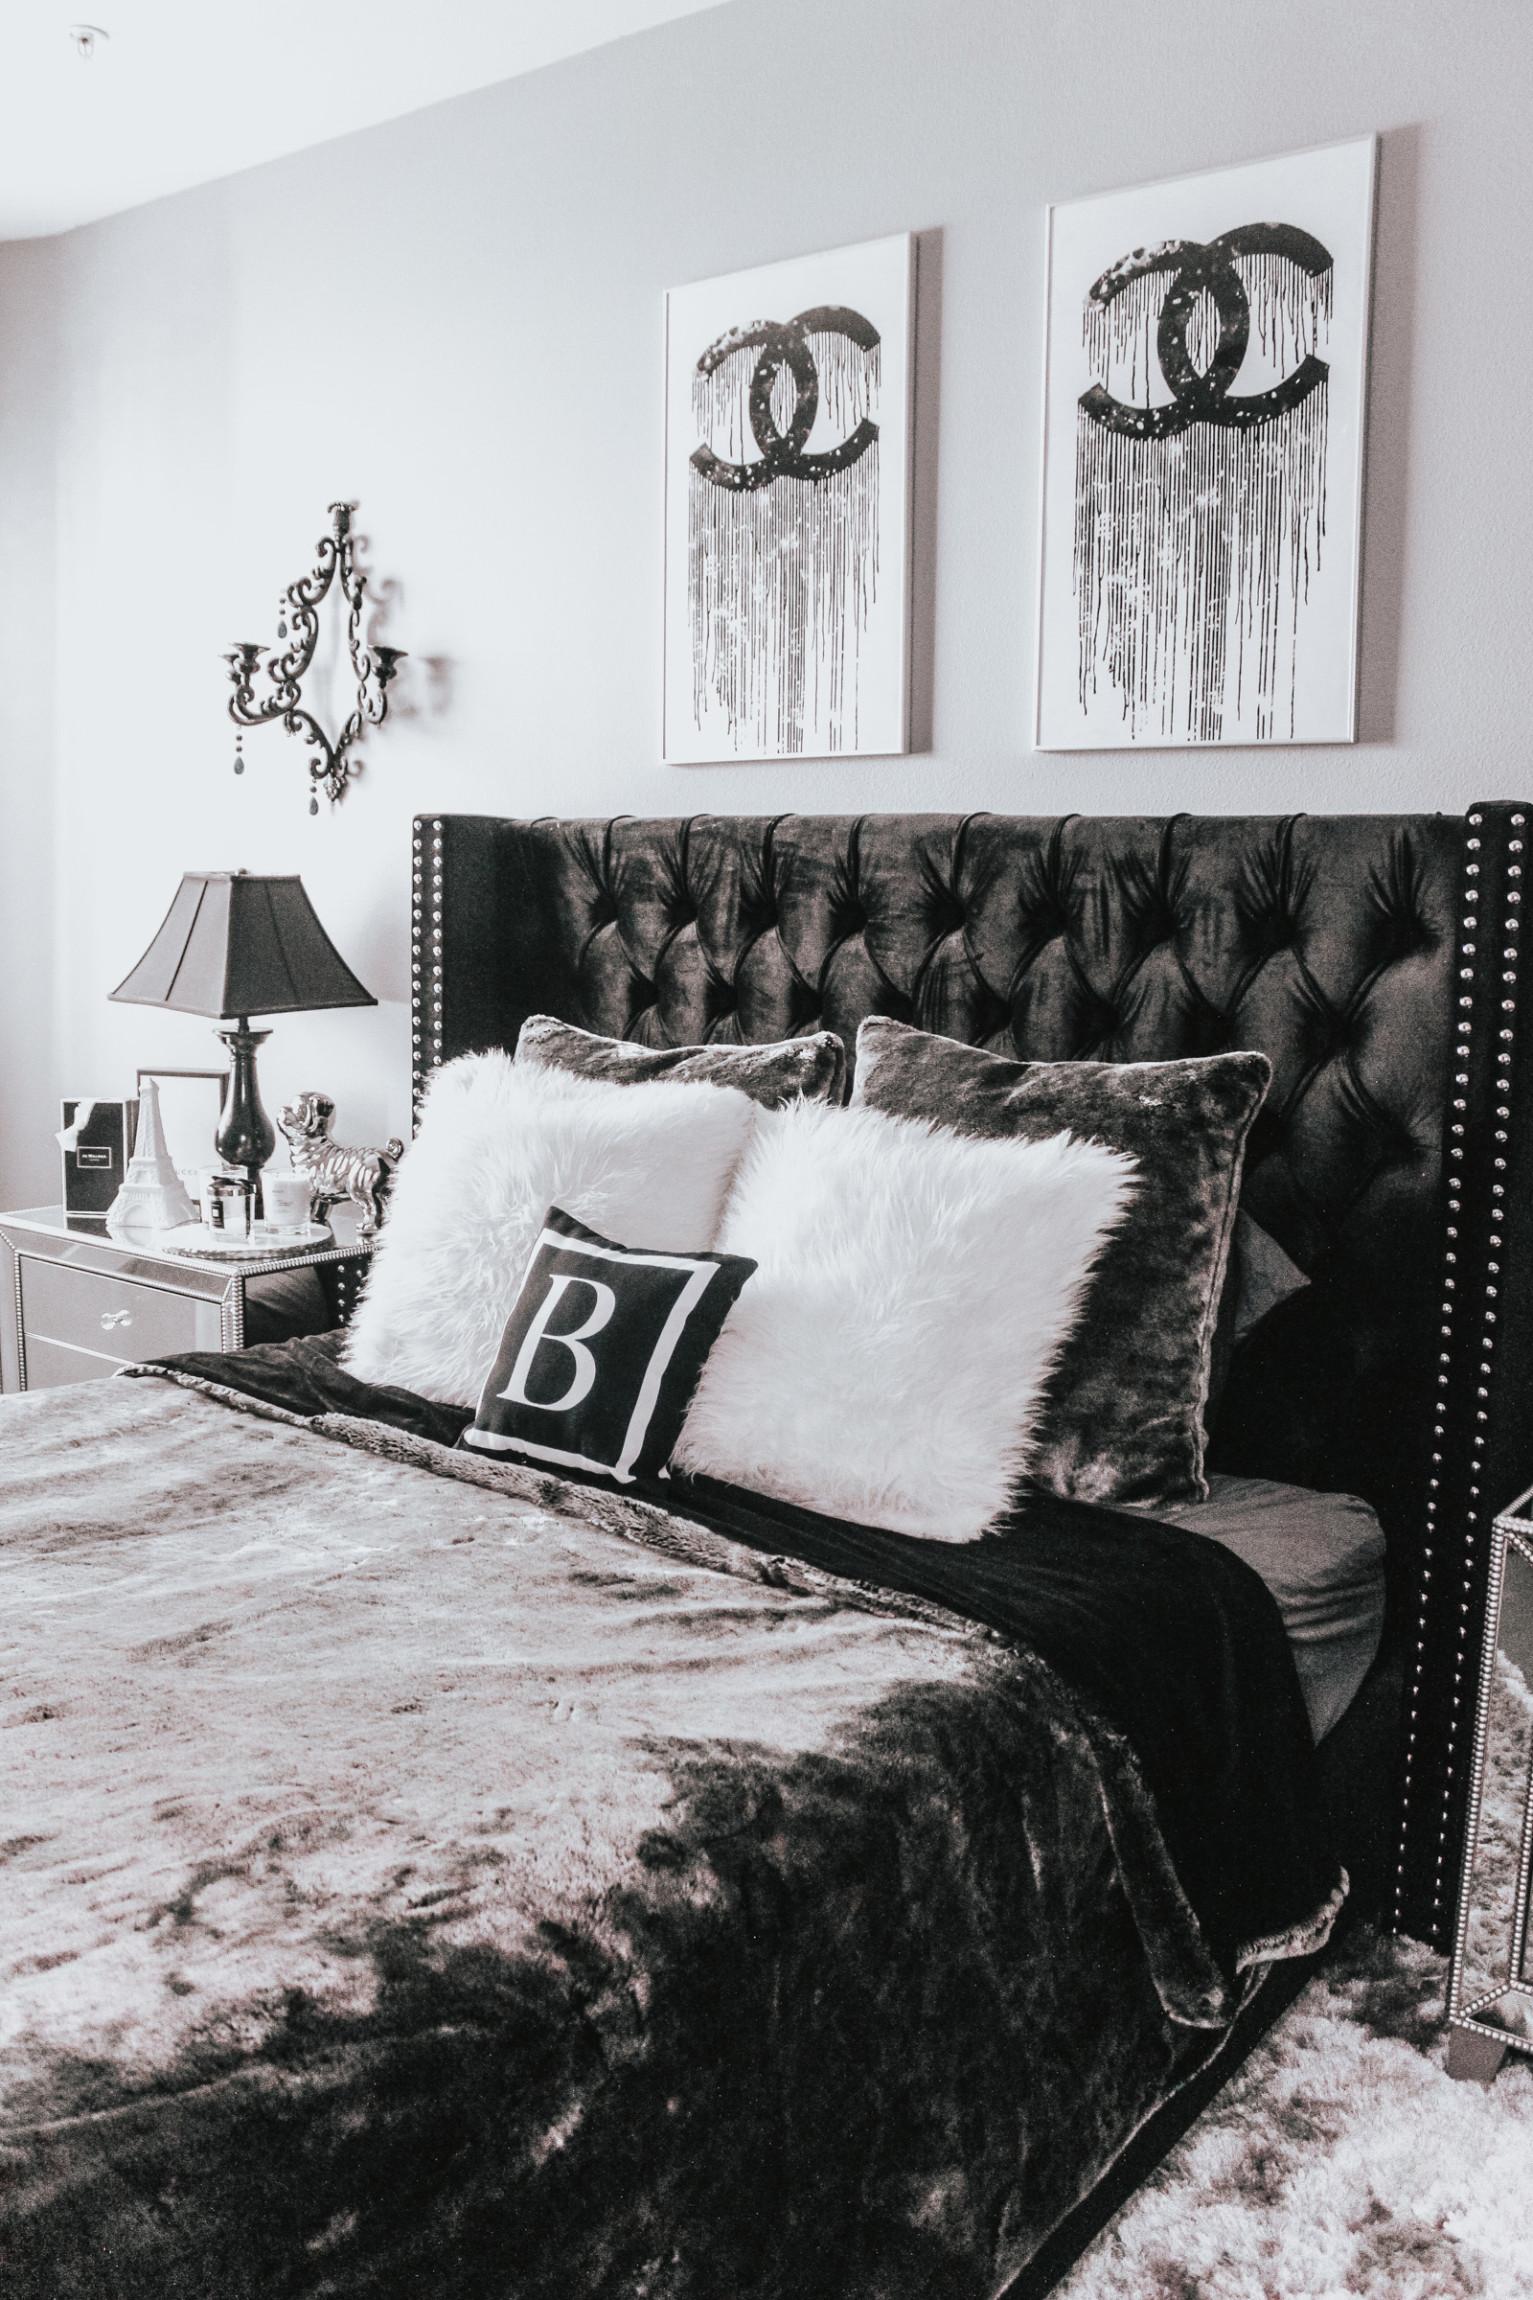 Bedroom Decor Updates  BLONDIE IN THE CITY